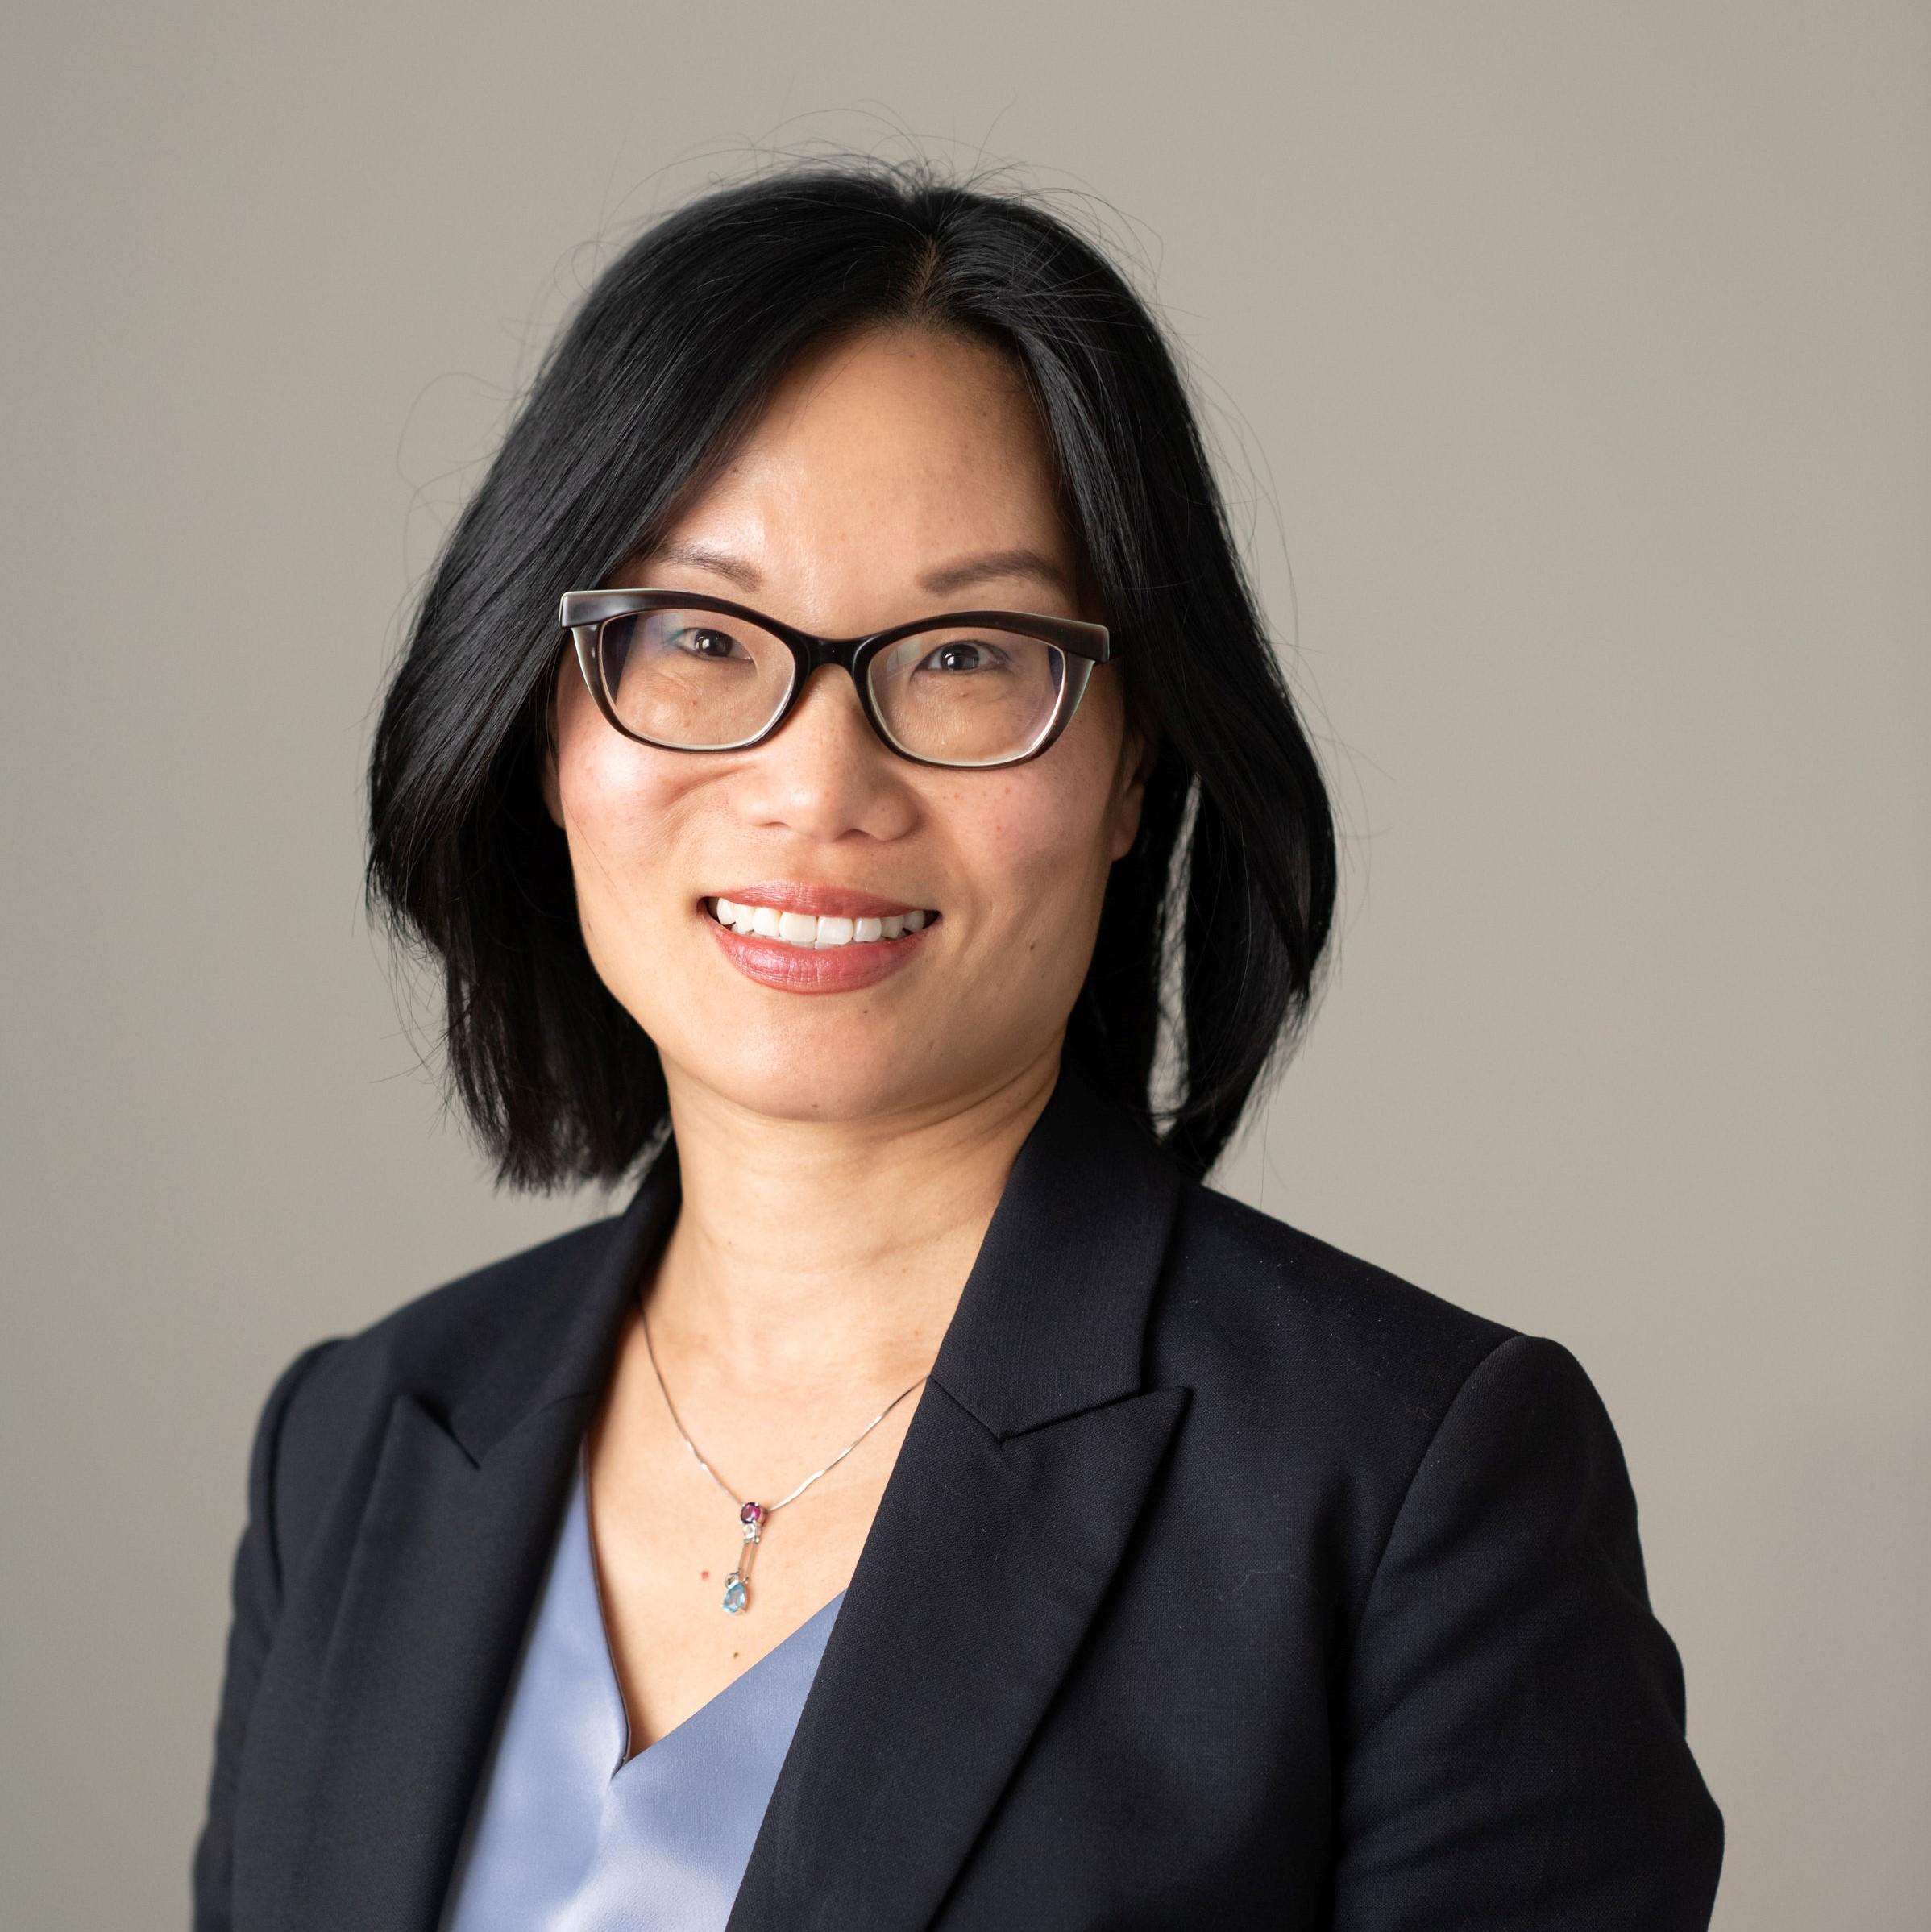 Dr Cindy Mak